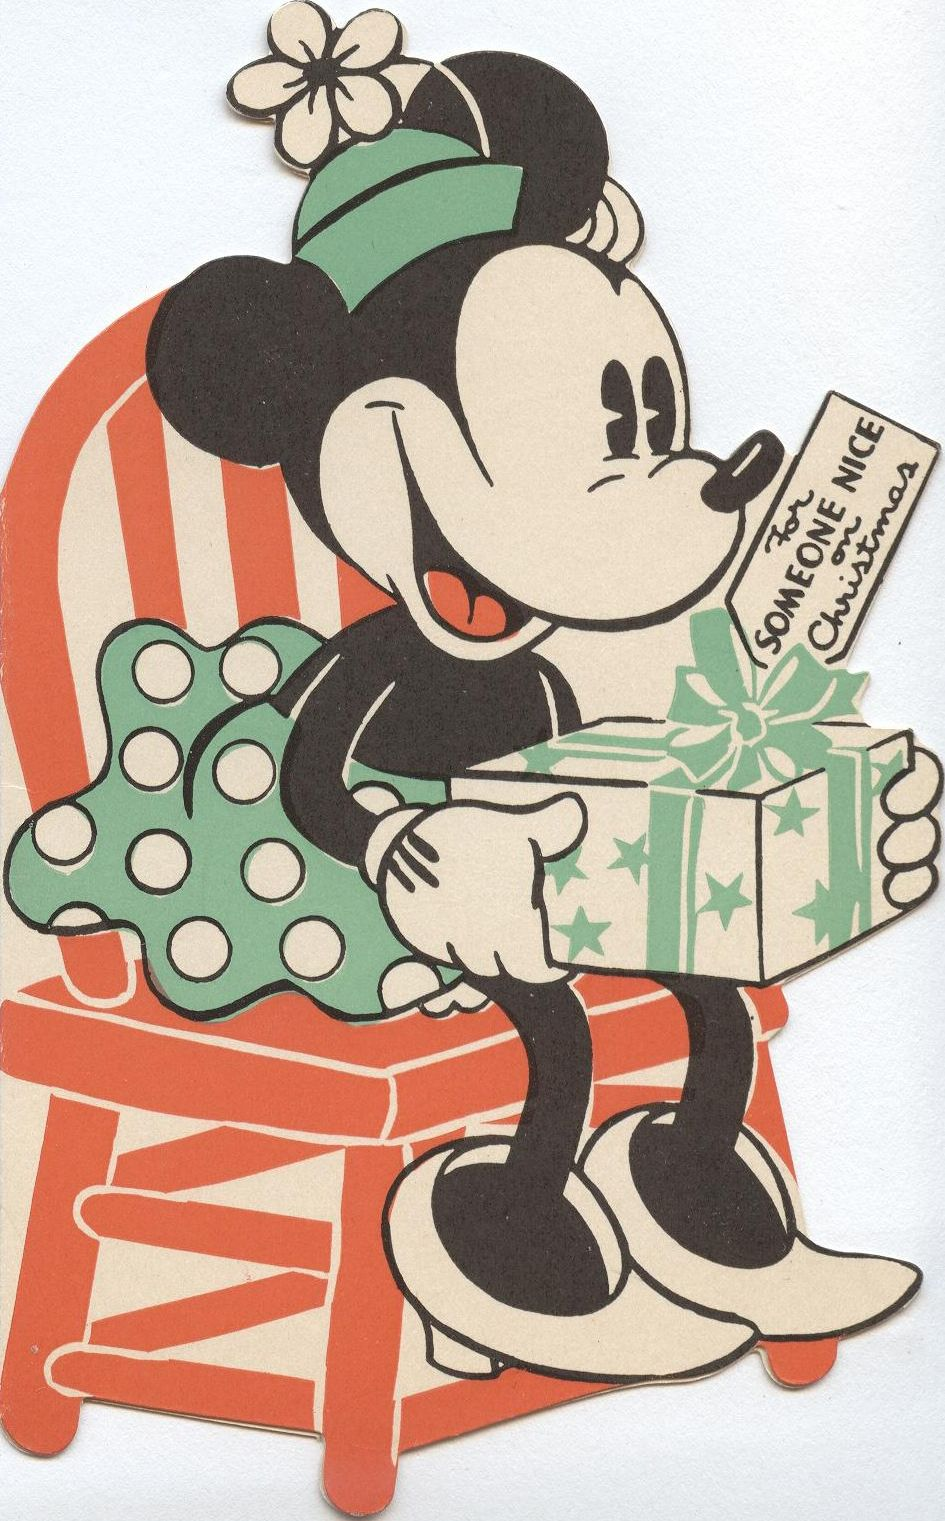 Minnie Mouse Christmas card | Vintage Christmas cards ...